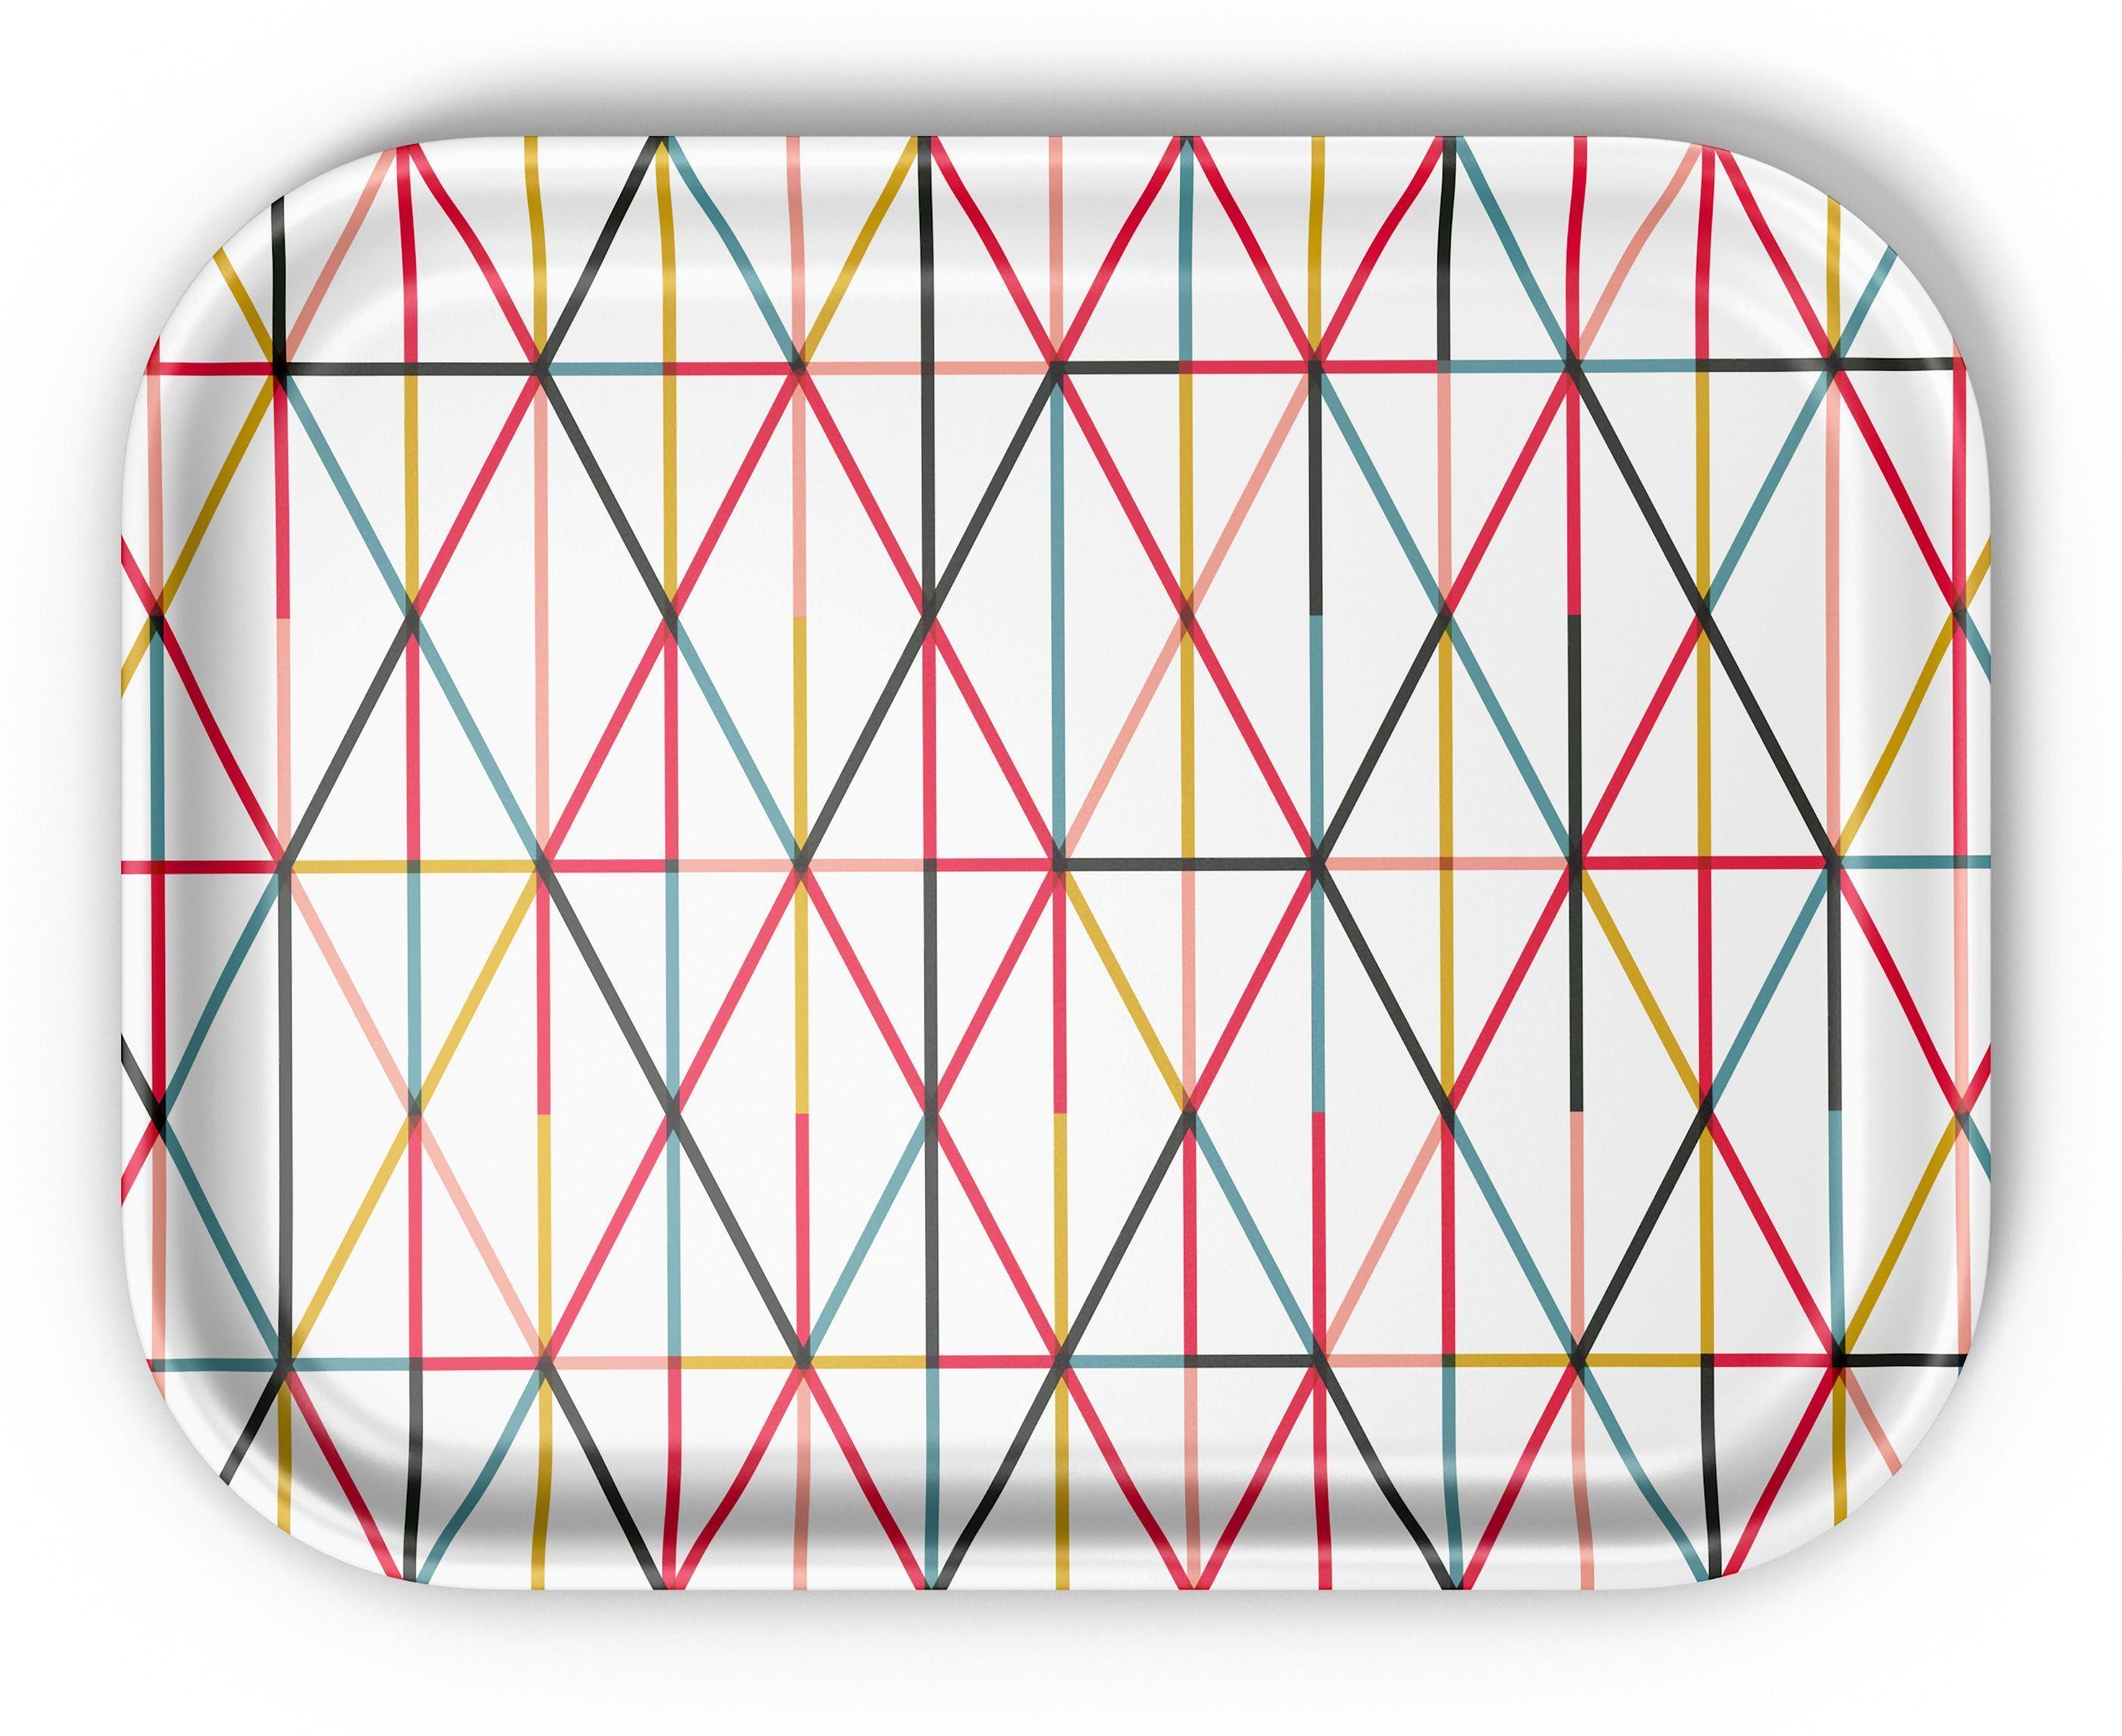 Vitra Classic Tray Grid dienblad medium kopen